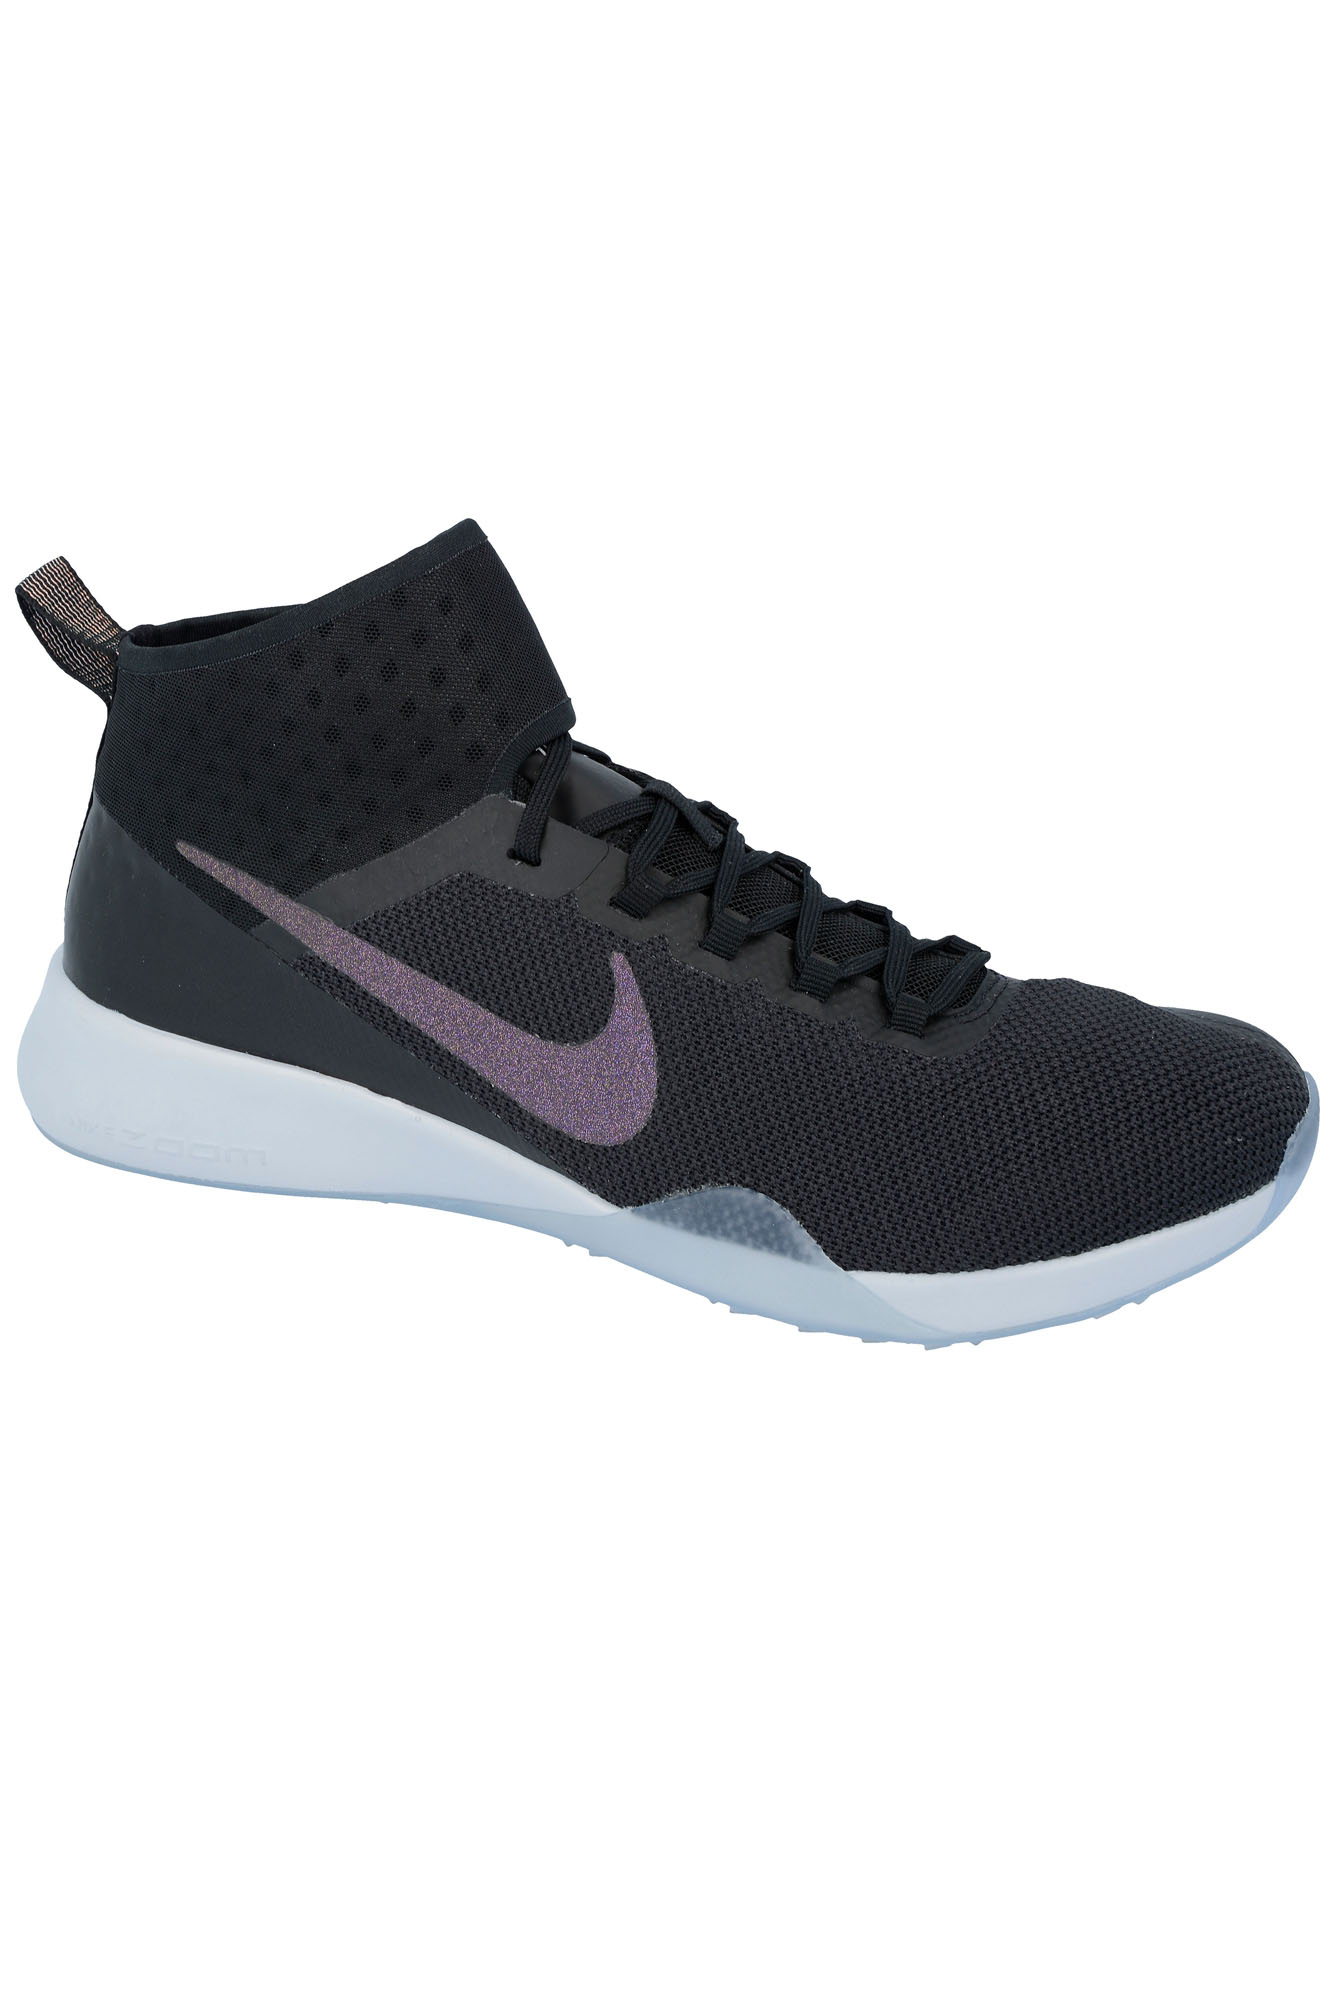 401cbf9af Buty Nike Air Zoom Strong 2 Metallic - 922876-001 / Treningowe ...